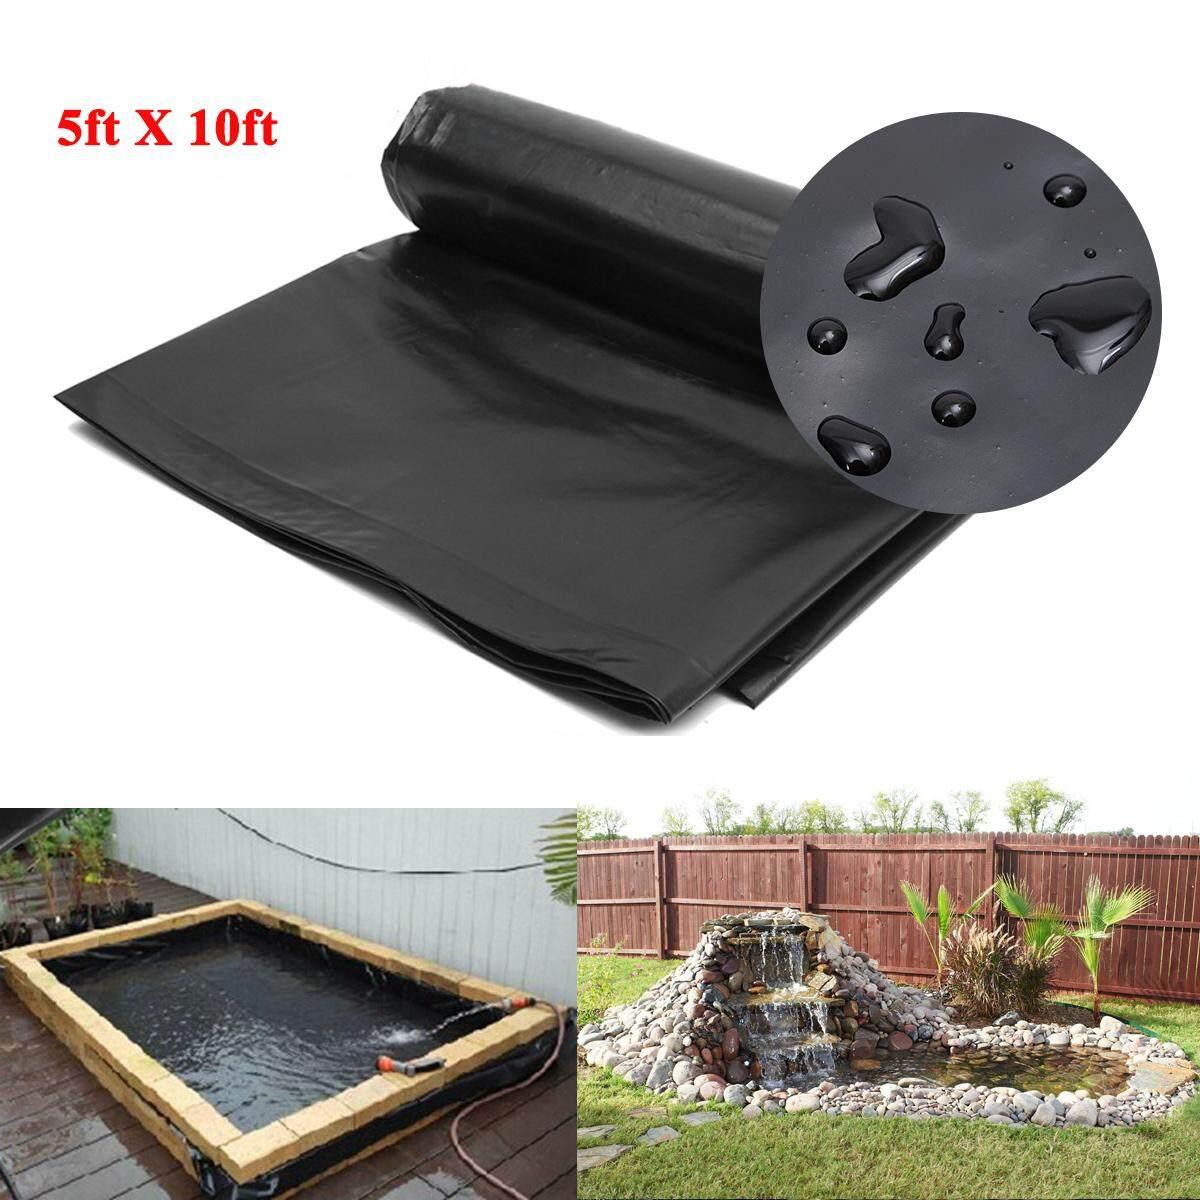 5'x10' HDPE Pond Liner Heavy Duty Landscaping Garden Pool Waterproof Liner Cloth